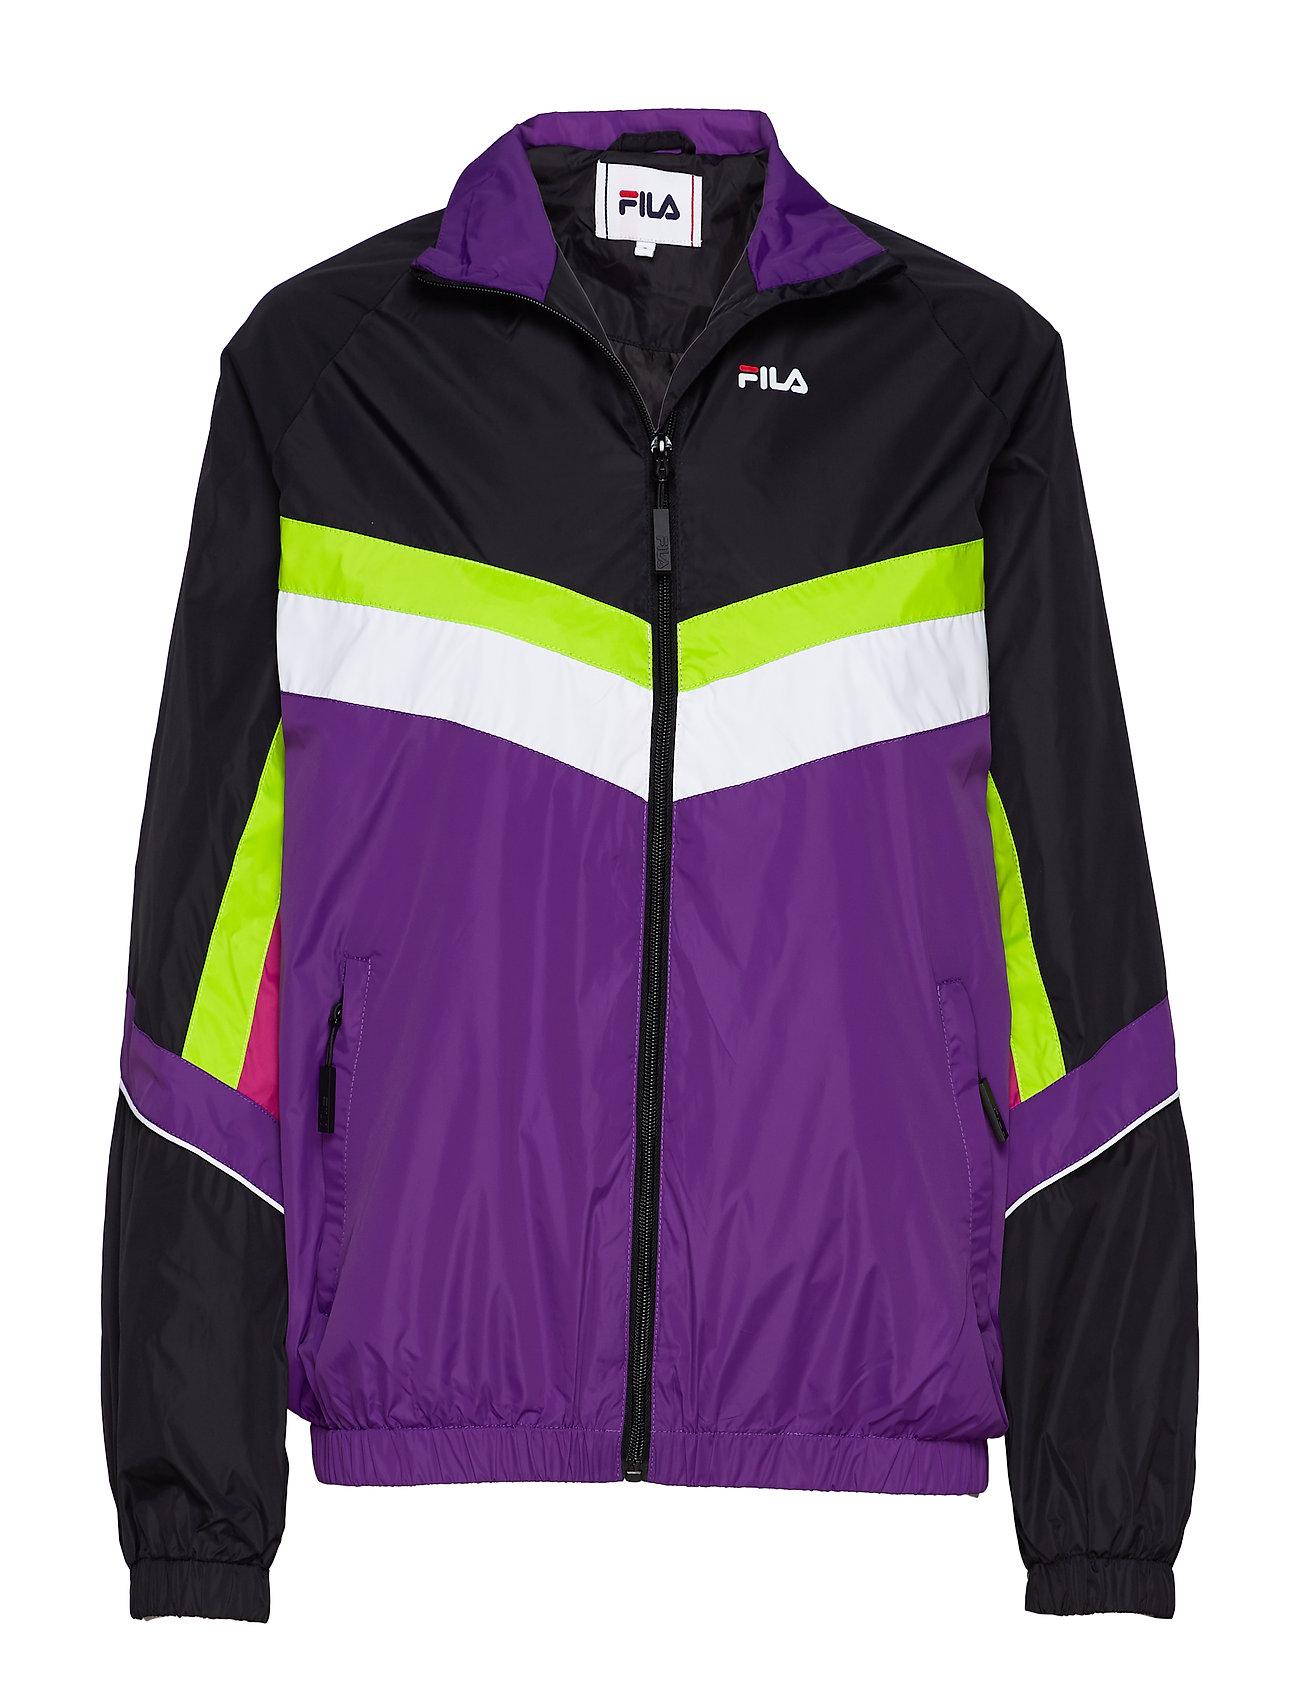 FILA WOMEN RANSOM wind jacket - A241 - BLACK-TILLANDSIA PURPLE-BRIGHT WHITE-ACID LIME